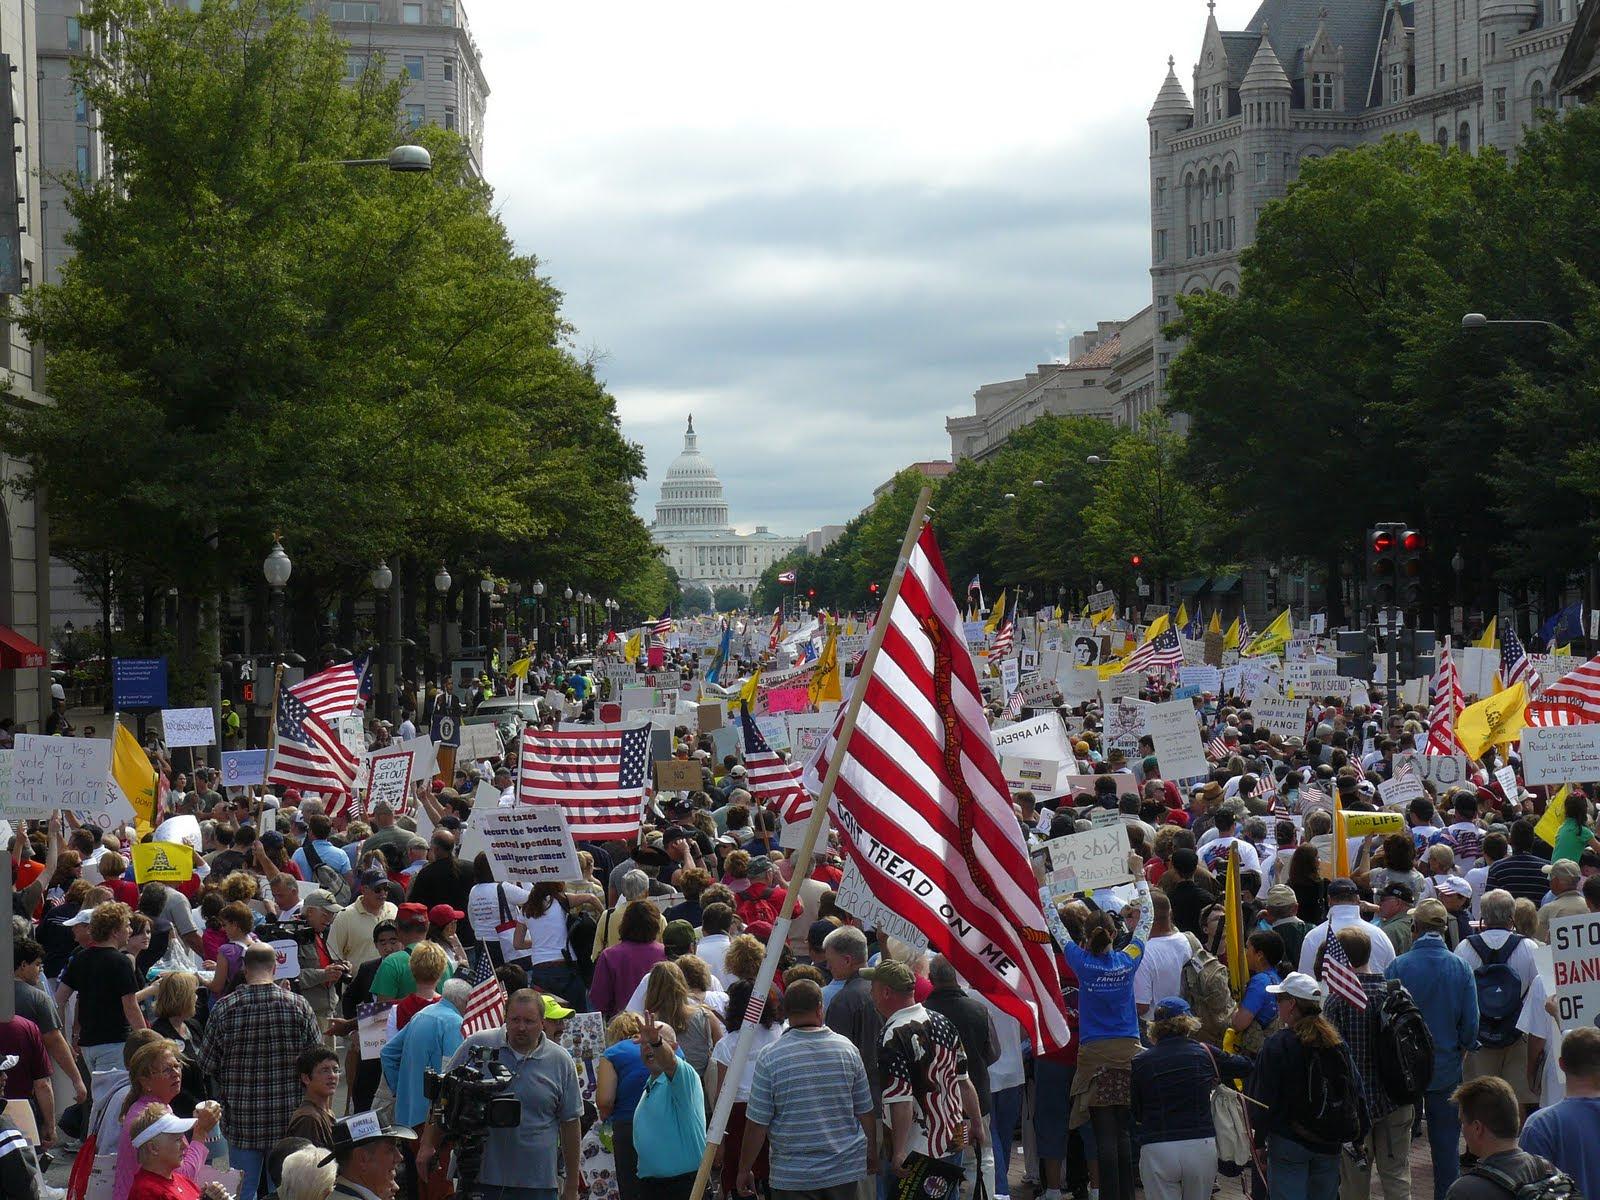 Tea Party Protest, Washington D.C. September 12, 2009